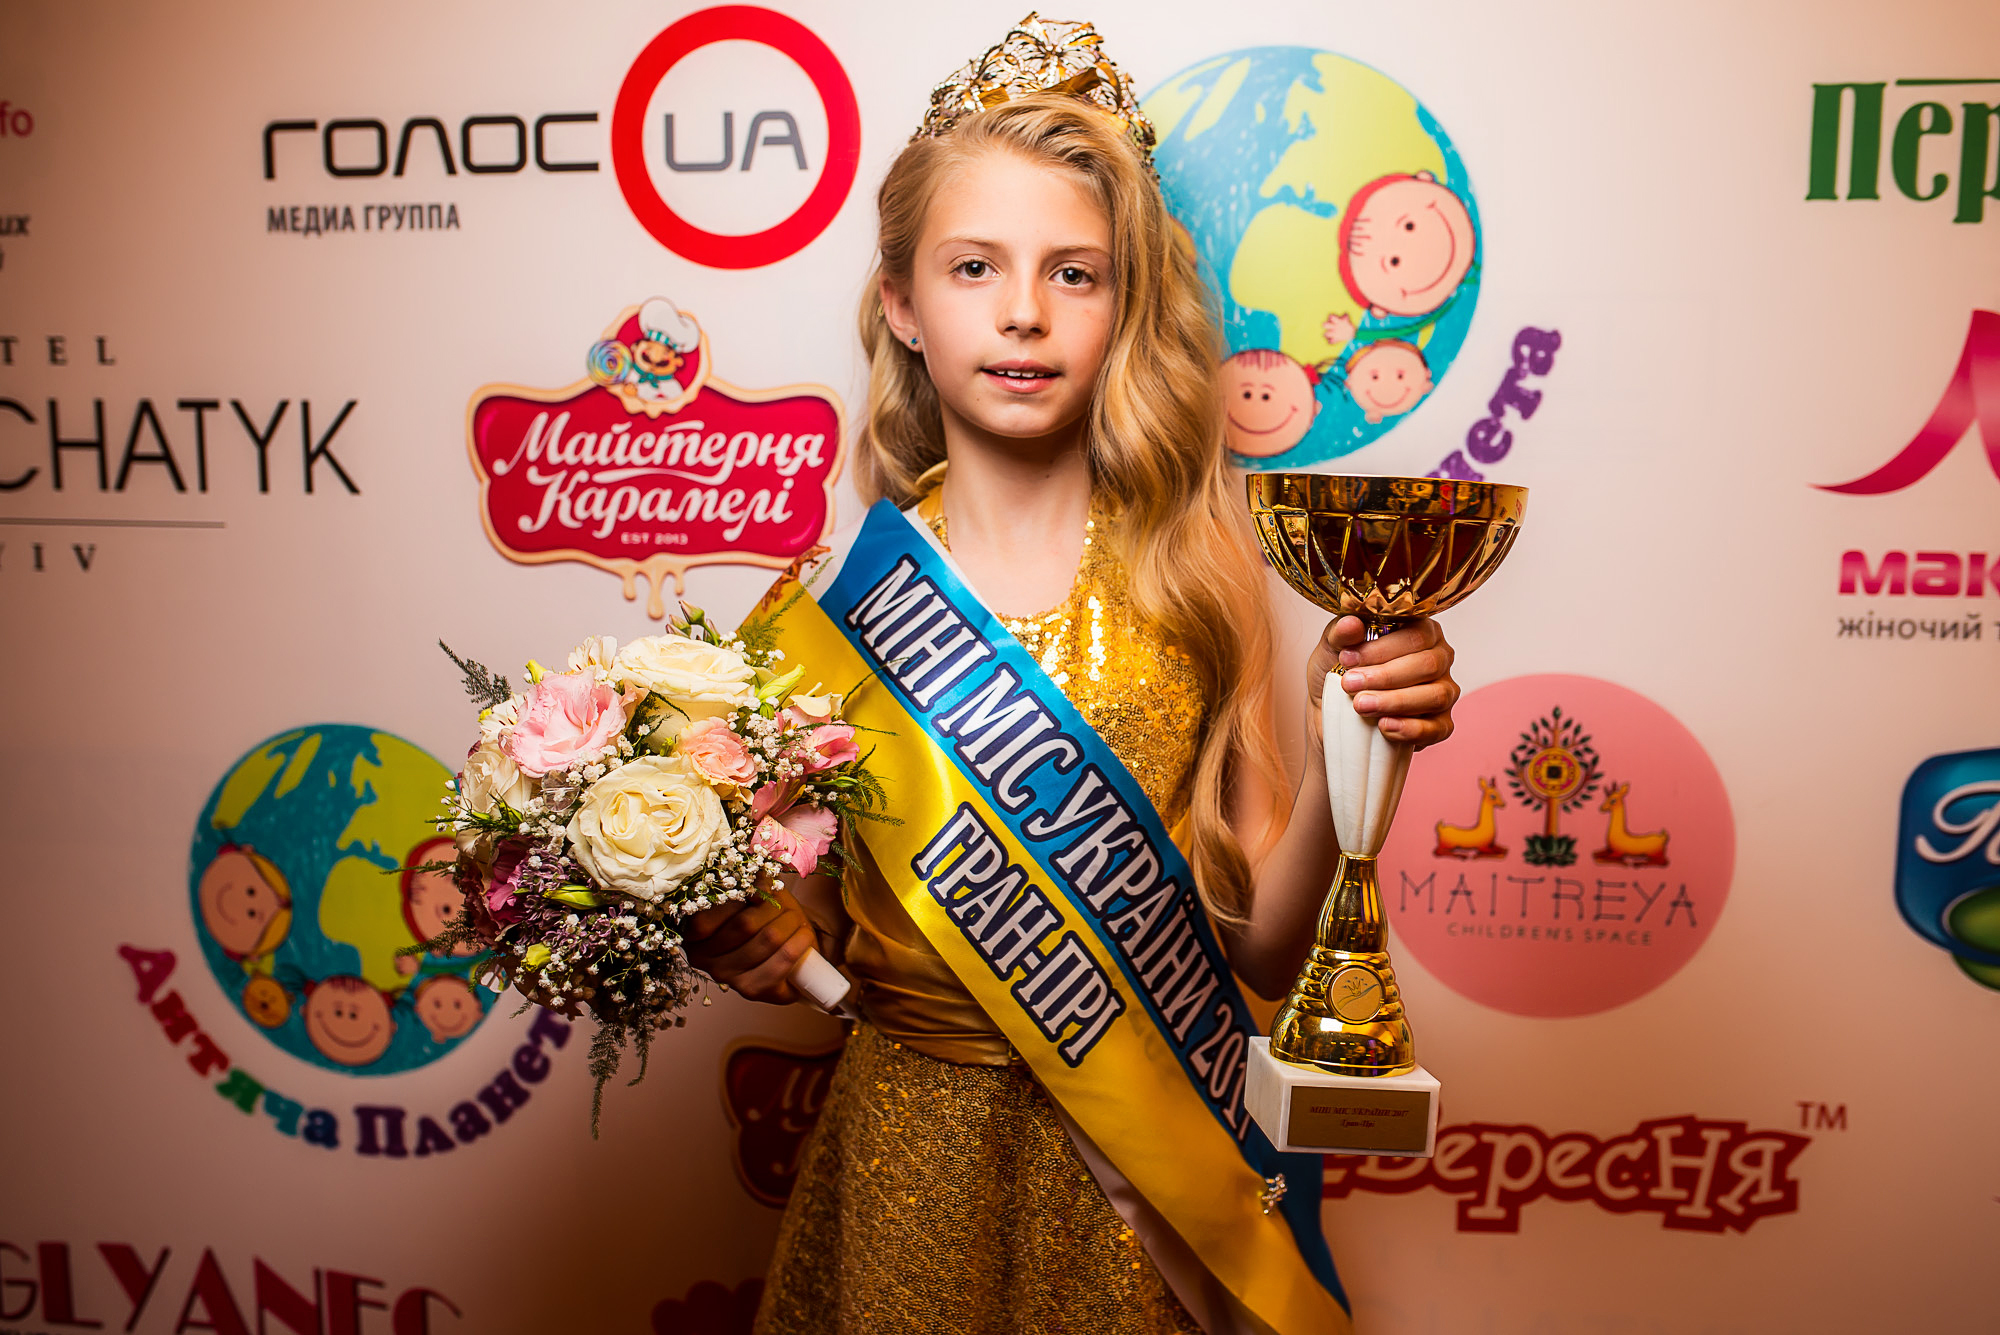 Mini Miss Ukraine 2017» became 9-year-old Sofia Garkushina